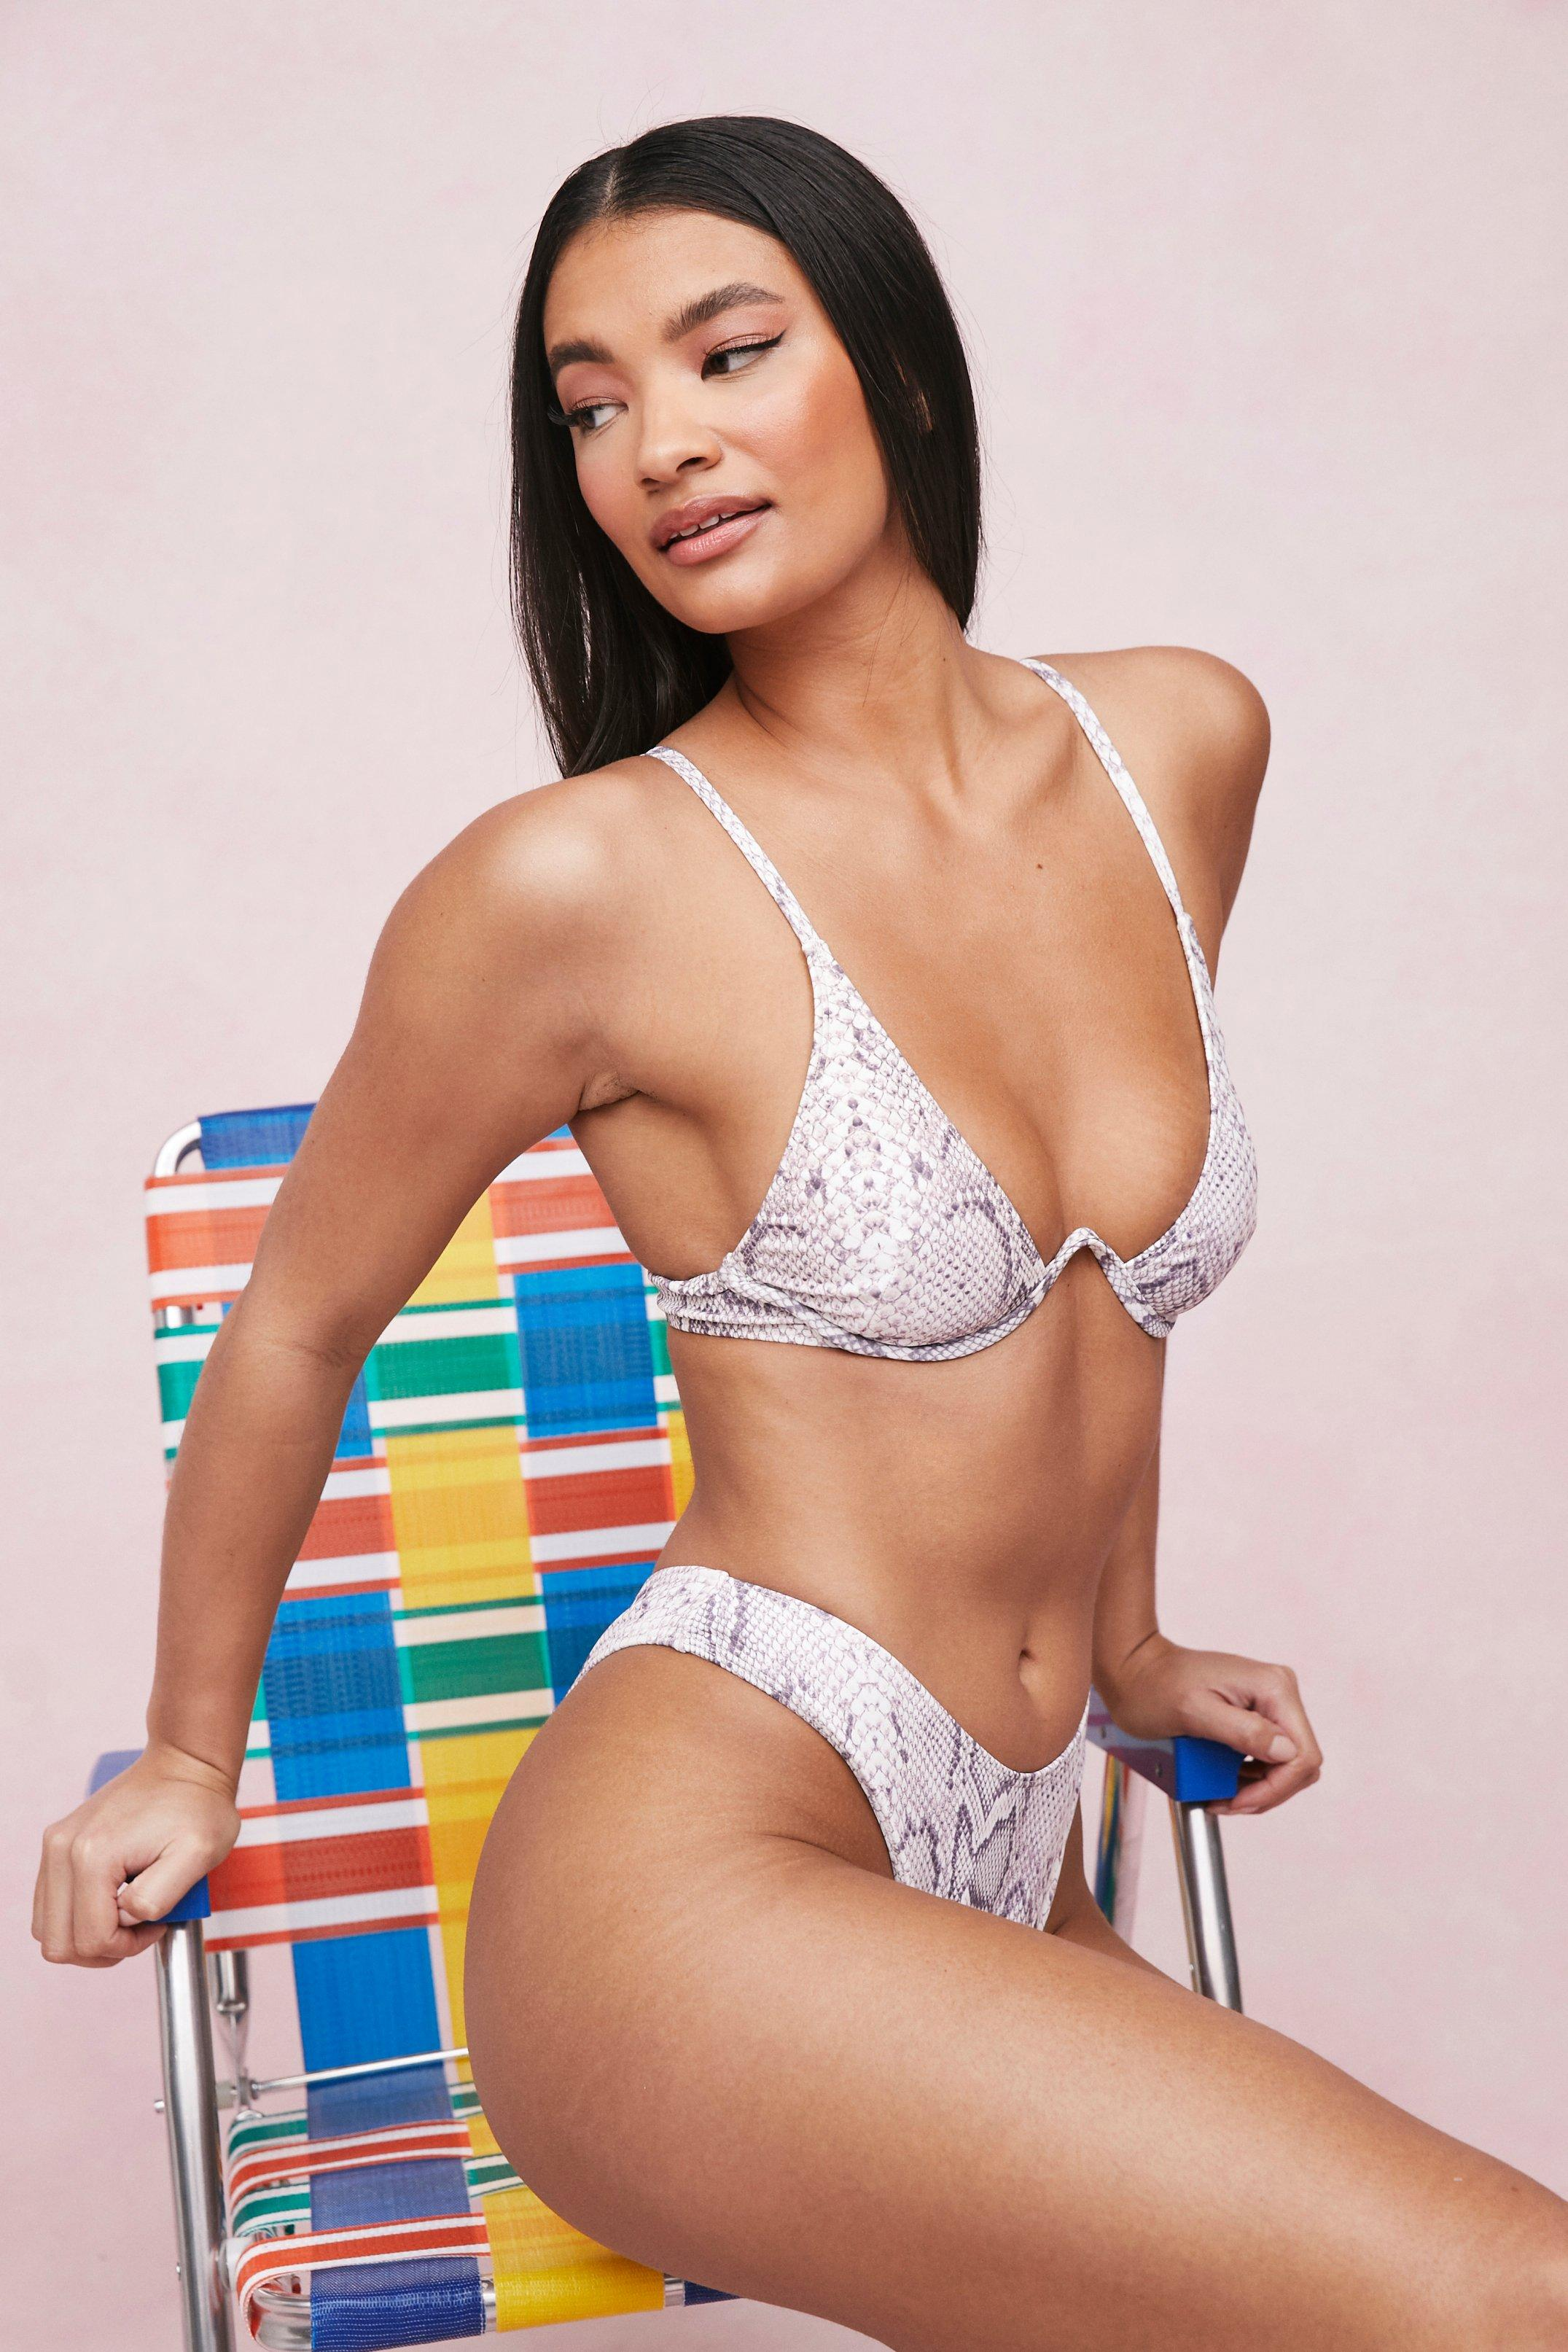 Bikini Haut De Bikini Bustier En V Et Bas Tanga À Imprimé Serpent - Beige - 36, Beige